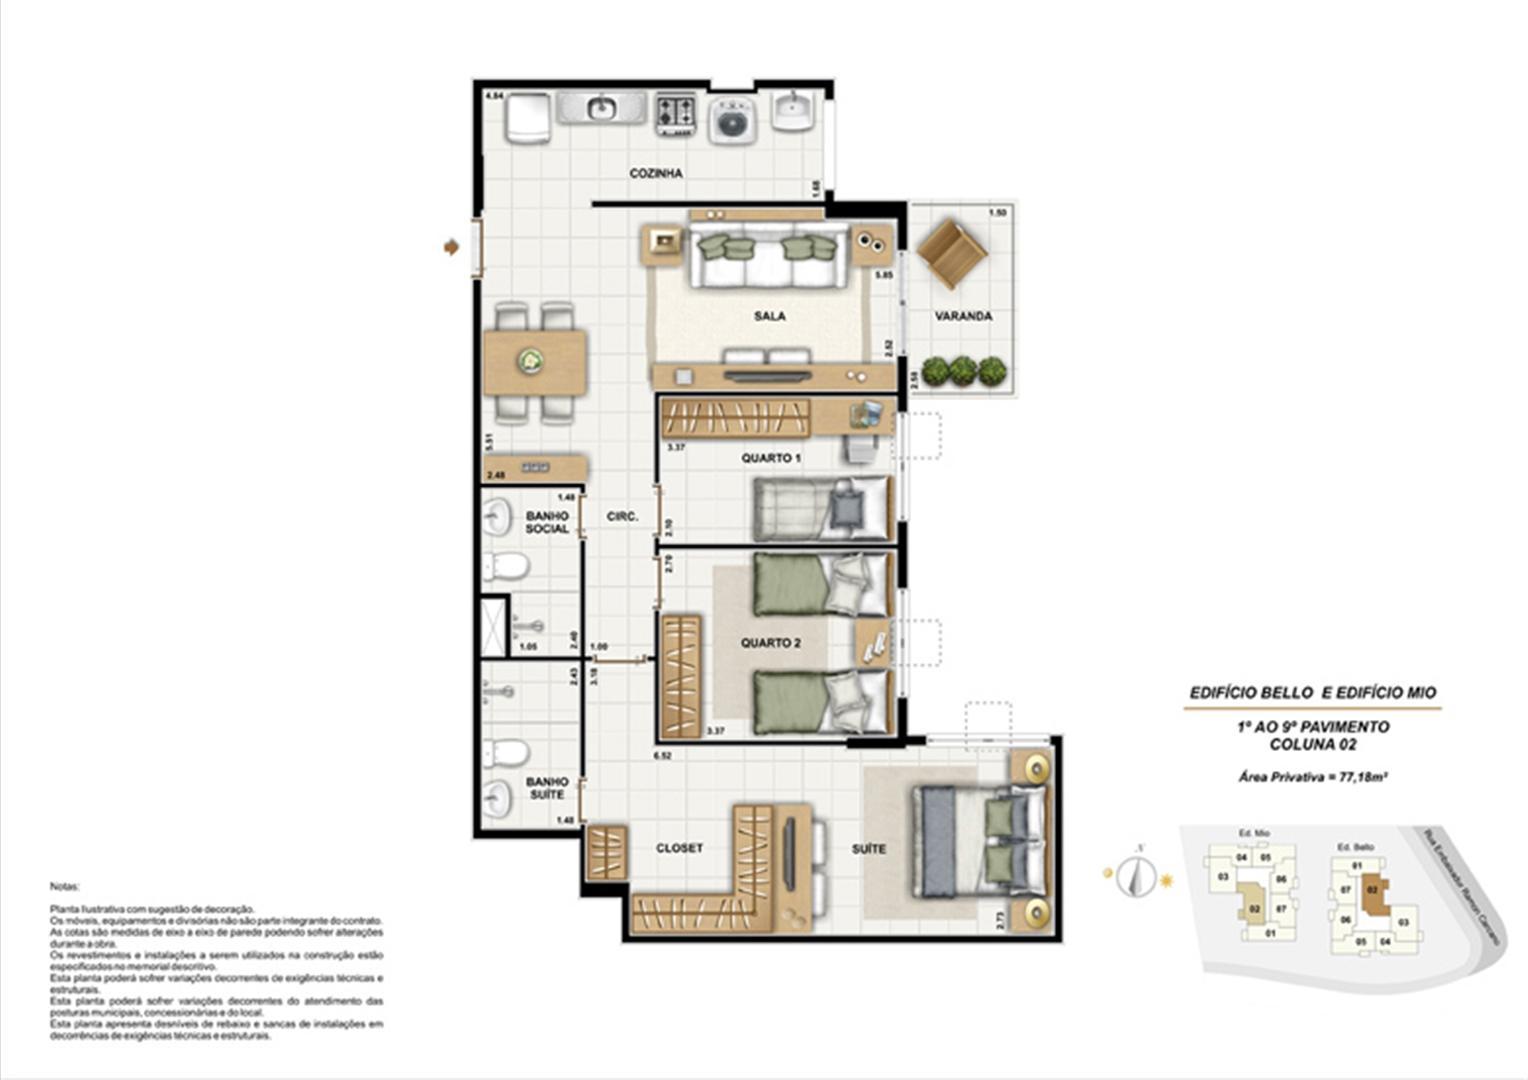 Ed. Bello e Mio 1º ao 9º Pavaimento Coluna 2 | Adorabile Tijuca – Apartamento na  Tijuca - Rio de Janeiro - Rio de Janeiro